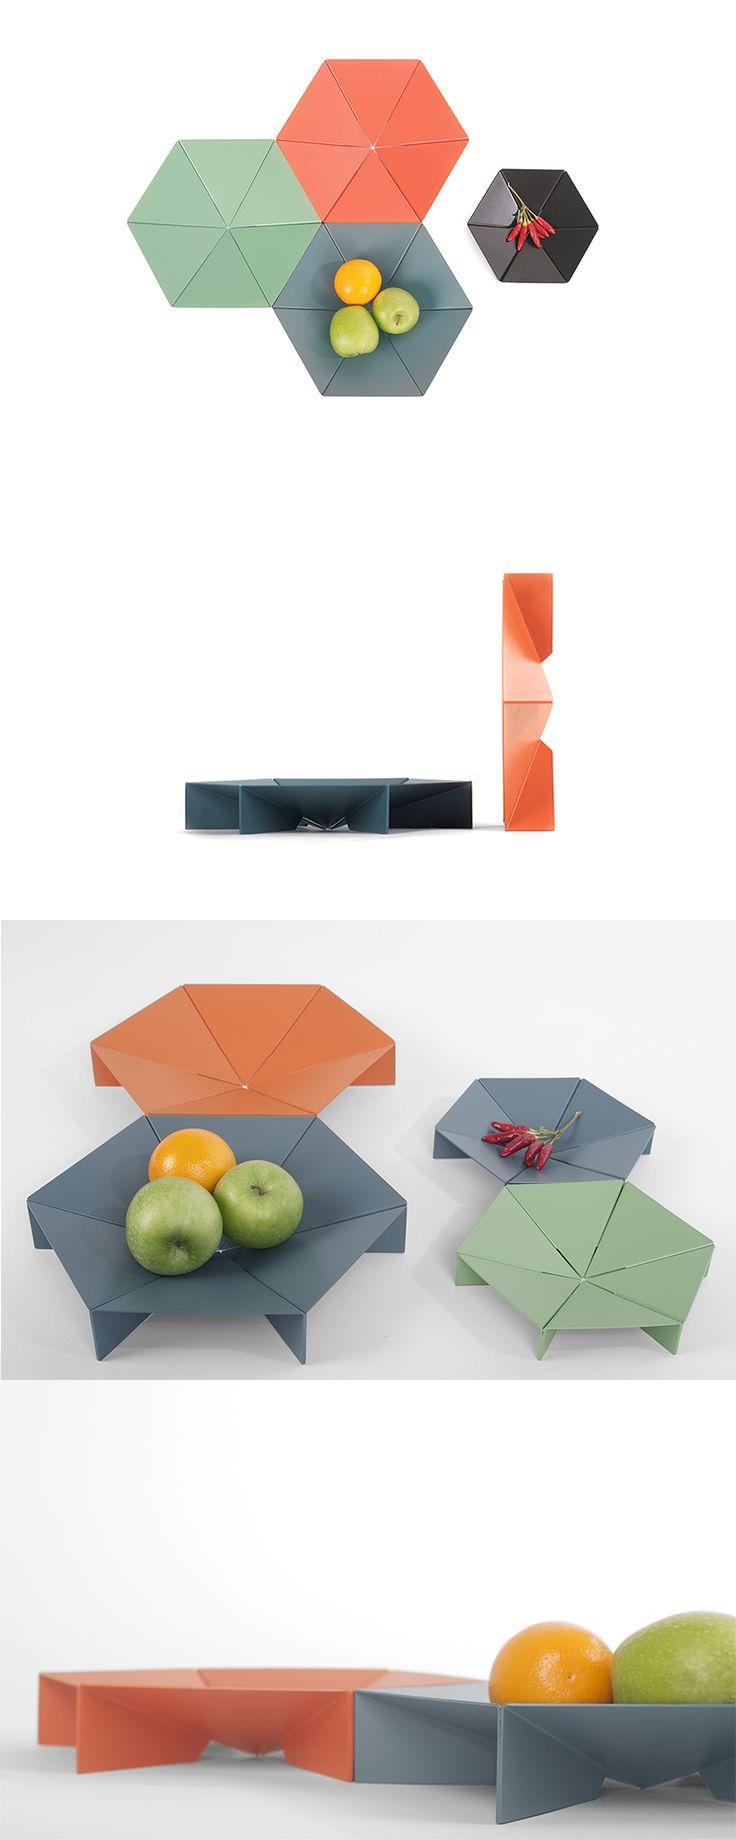 Offiseria, Product Design ─ Giulio Patrizi Design Agency ©   #product #design